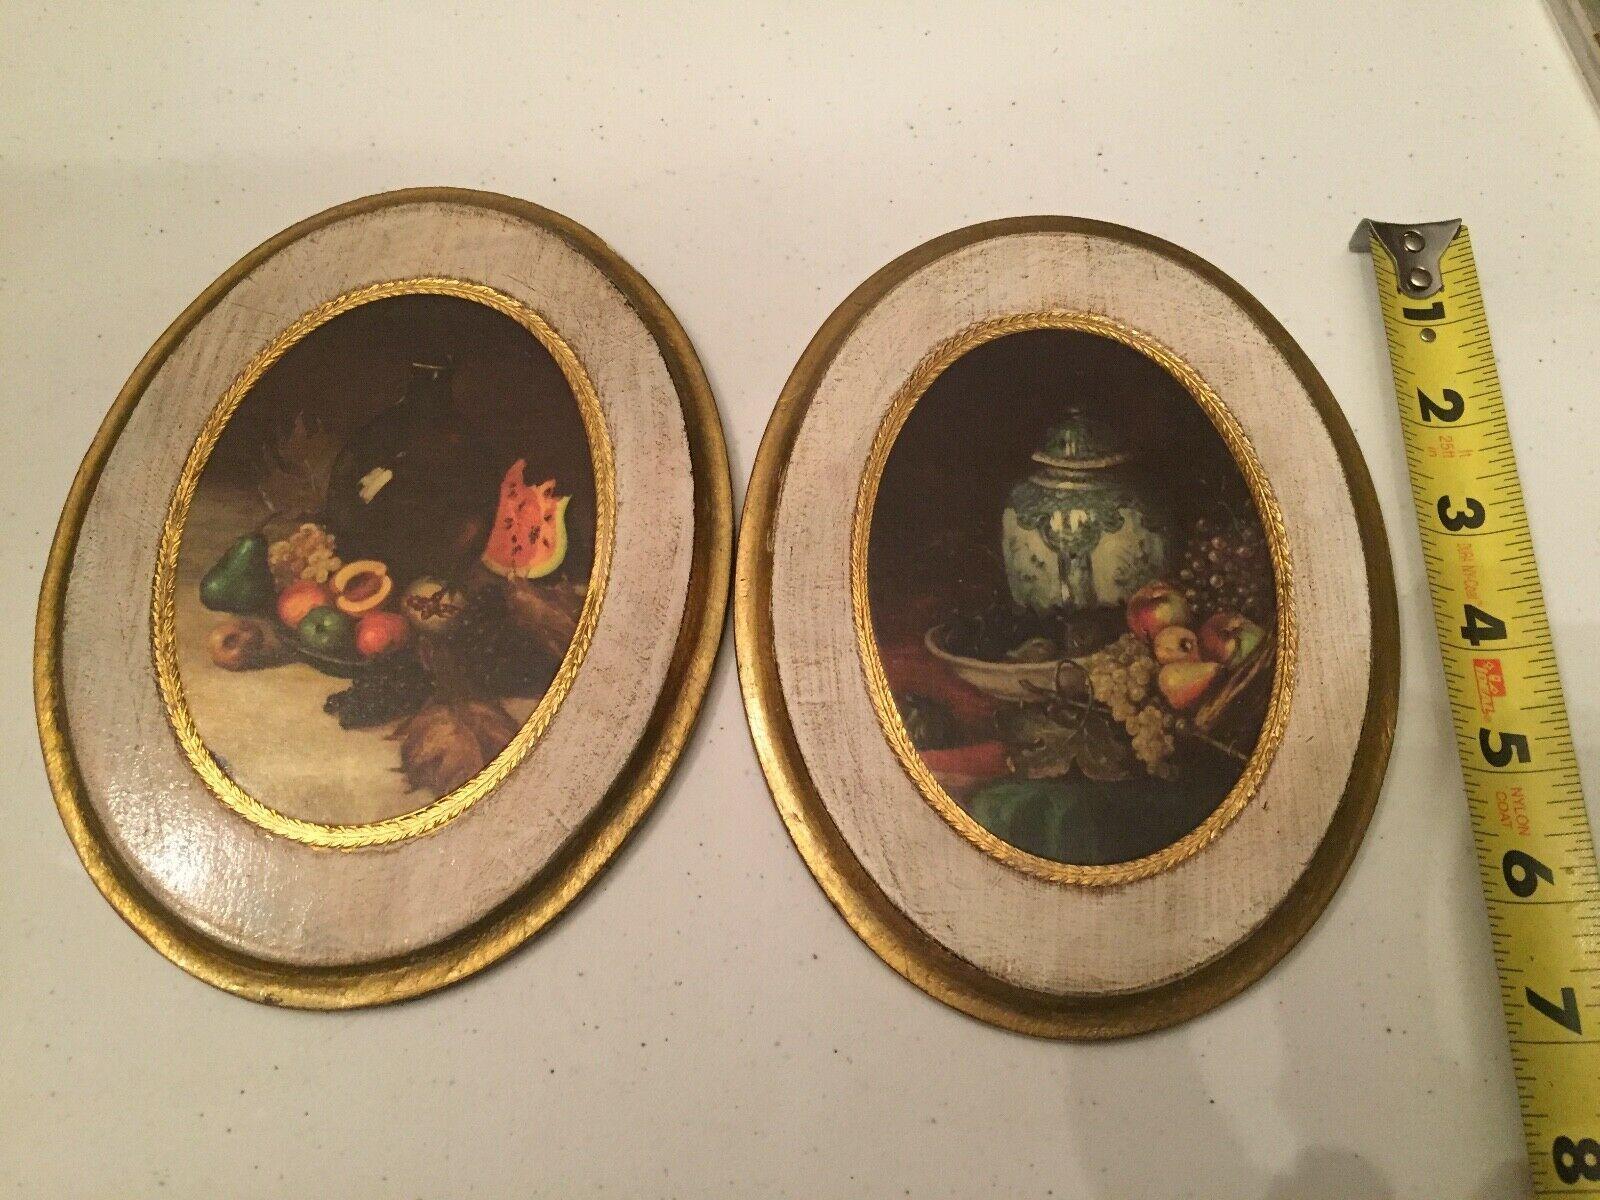 VTG Regency Gold Wall Plaque Fruit Ginger Jar Motif Made in Italy Oval Wood - $79.19